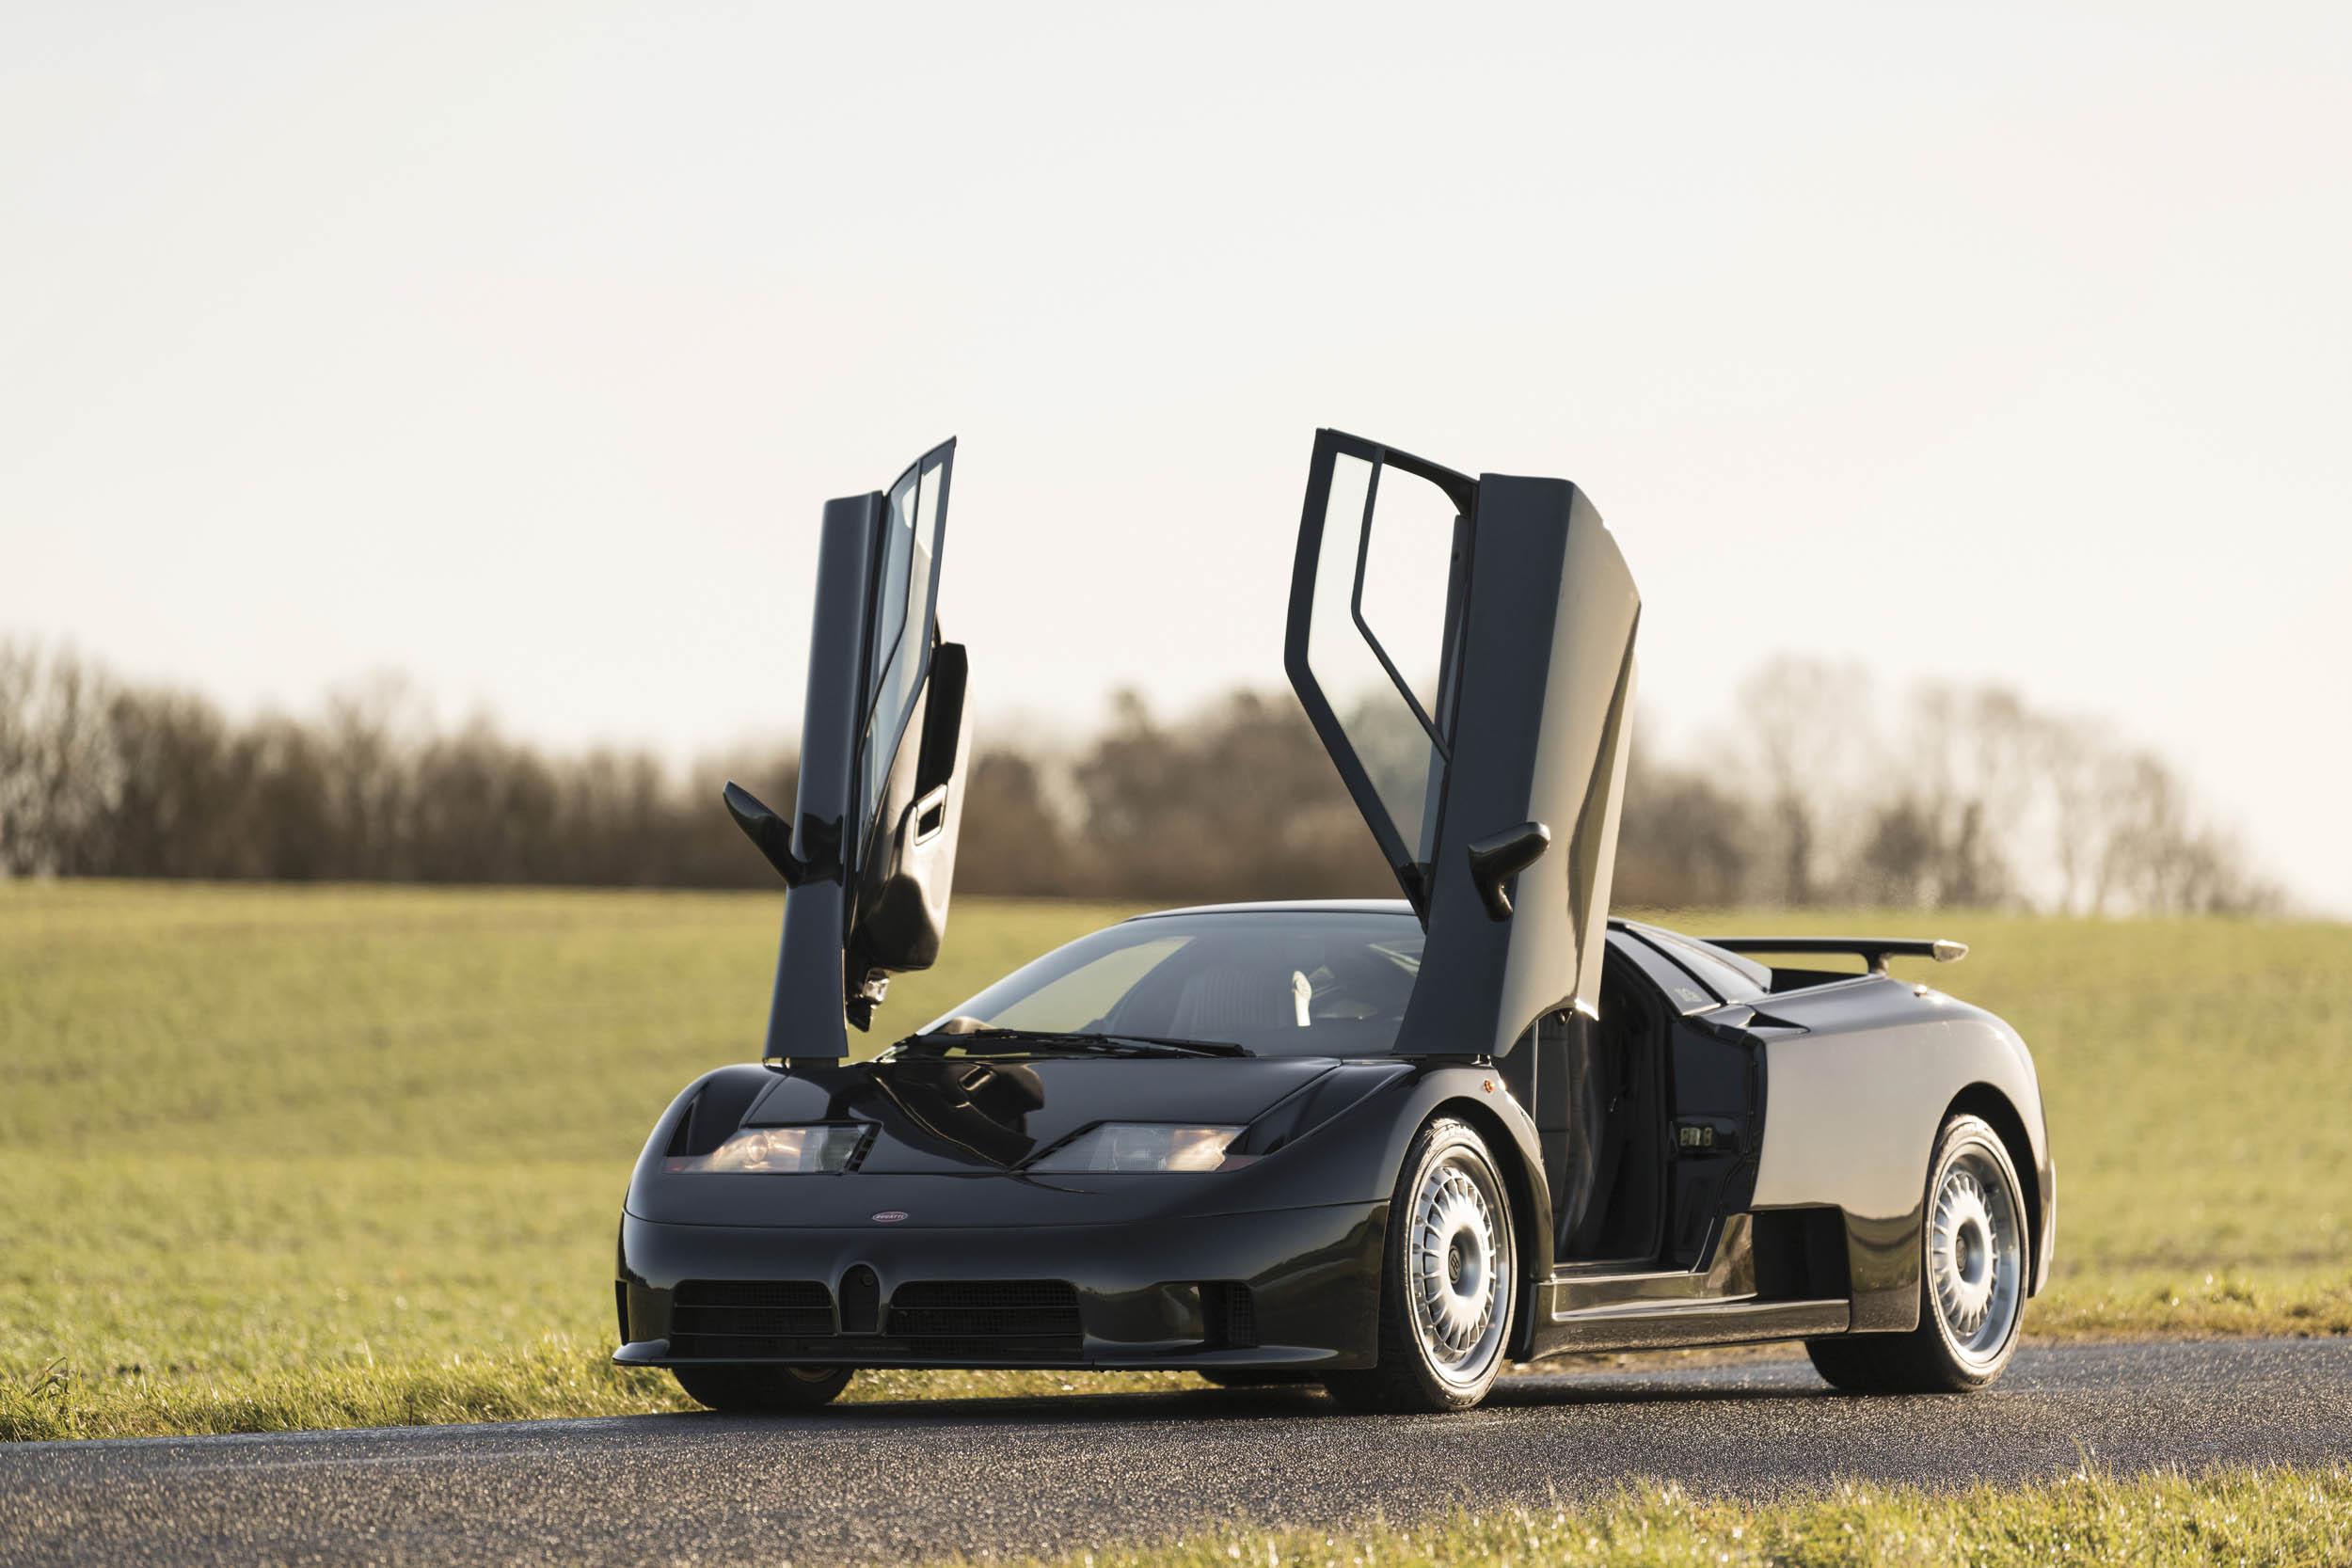 1993 Bugatti EB110 GT doors up